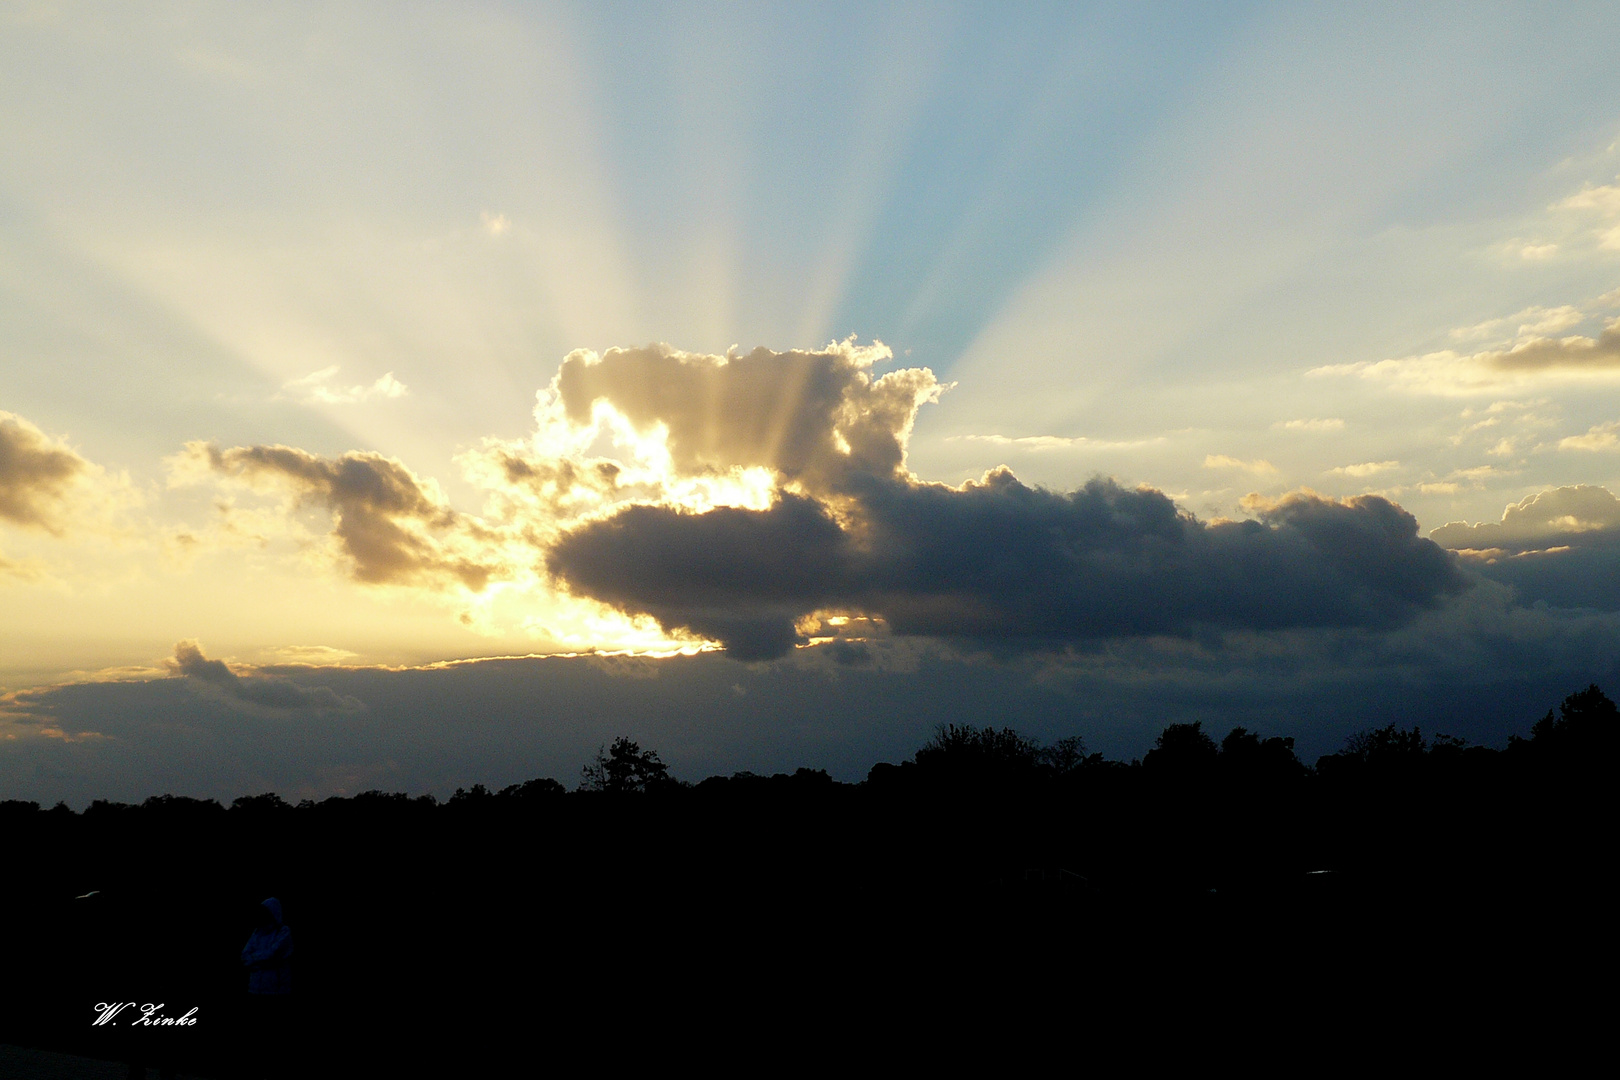 Sonnenuntergang im September auf dem Darß